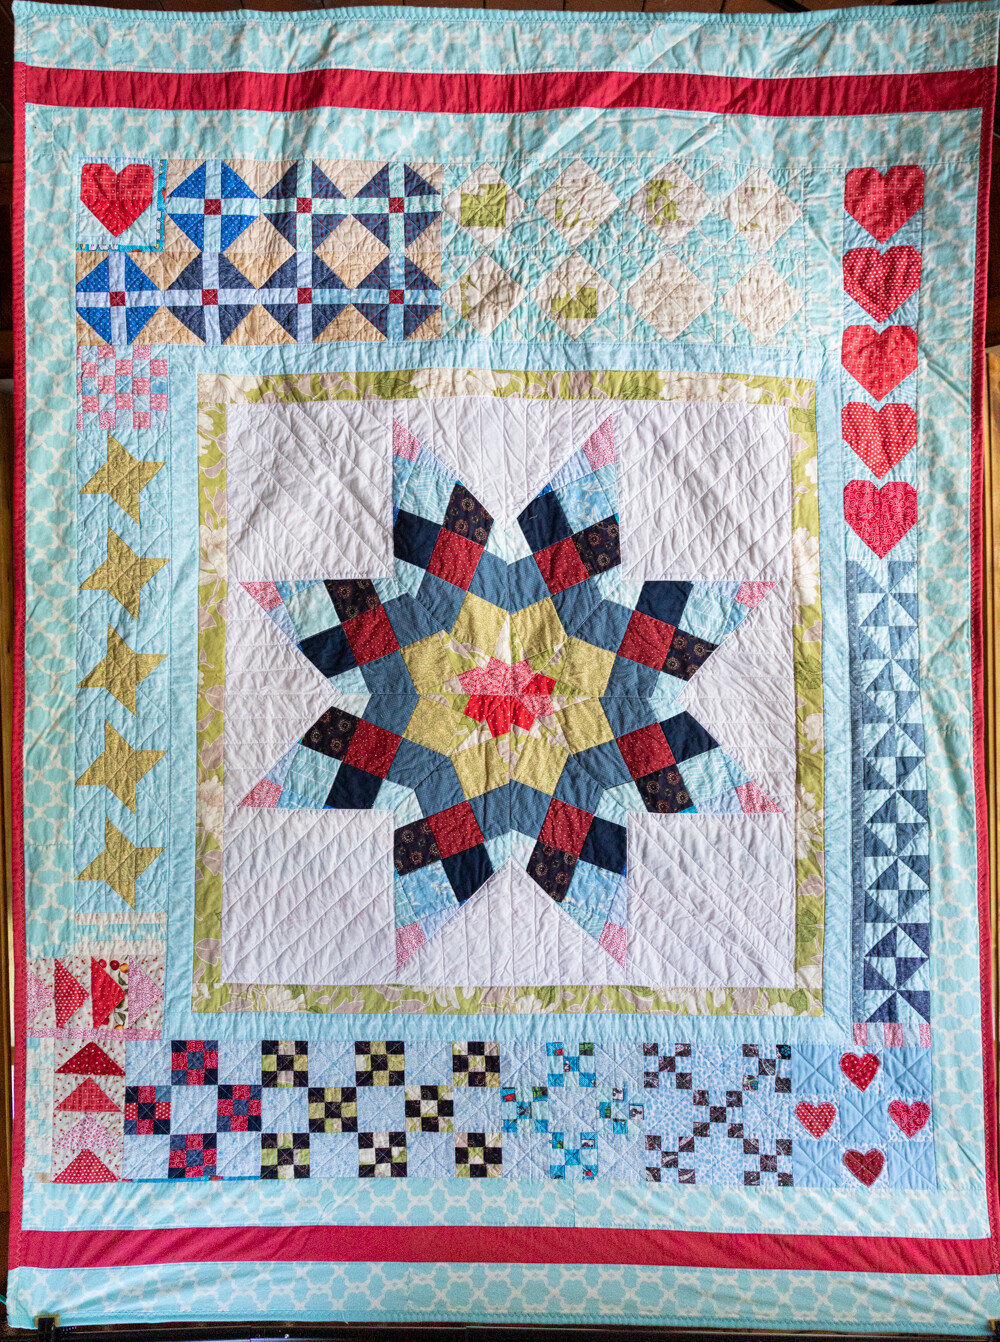 Quilt #11 - Winter Snowflake